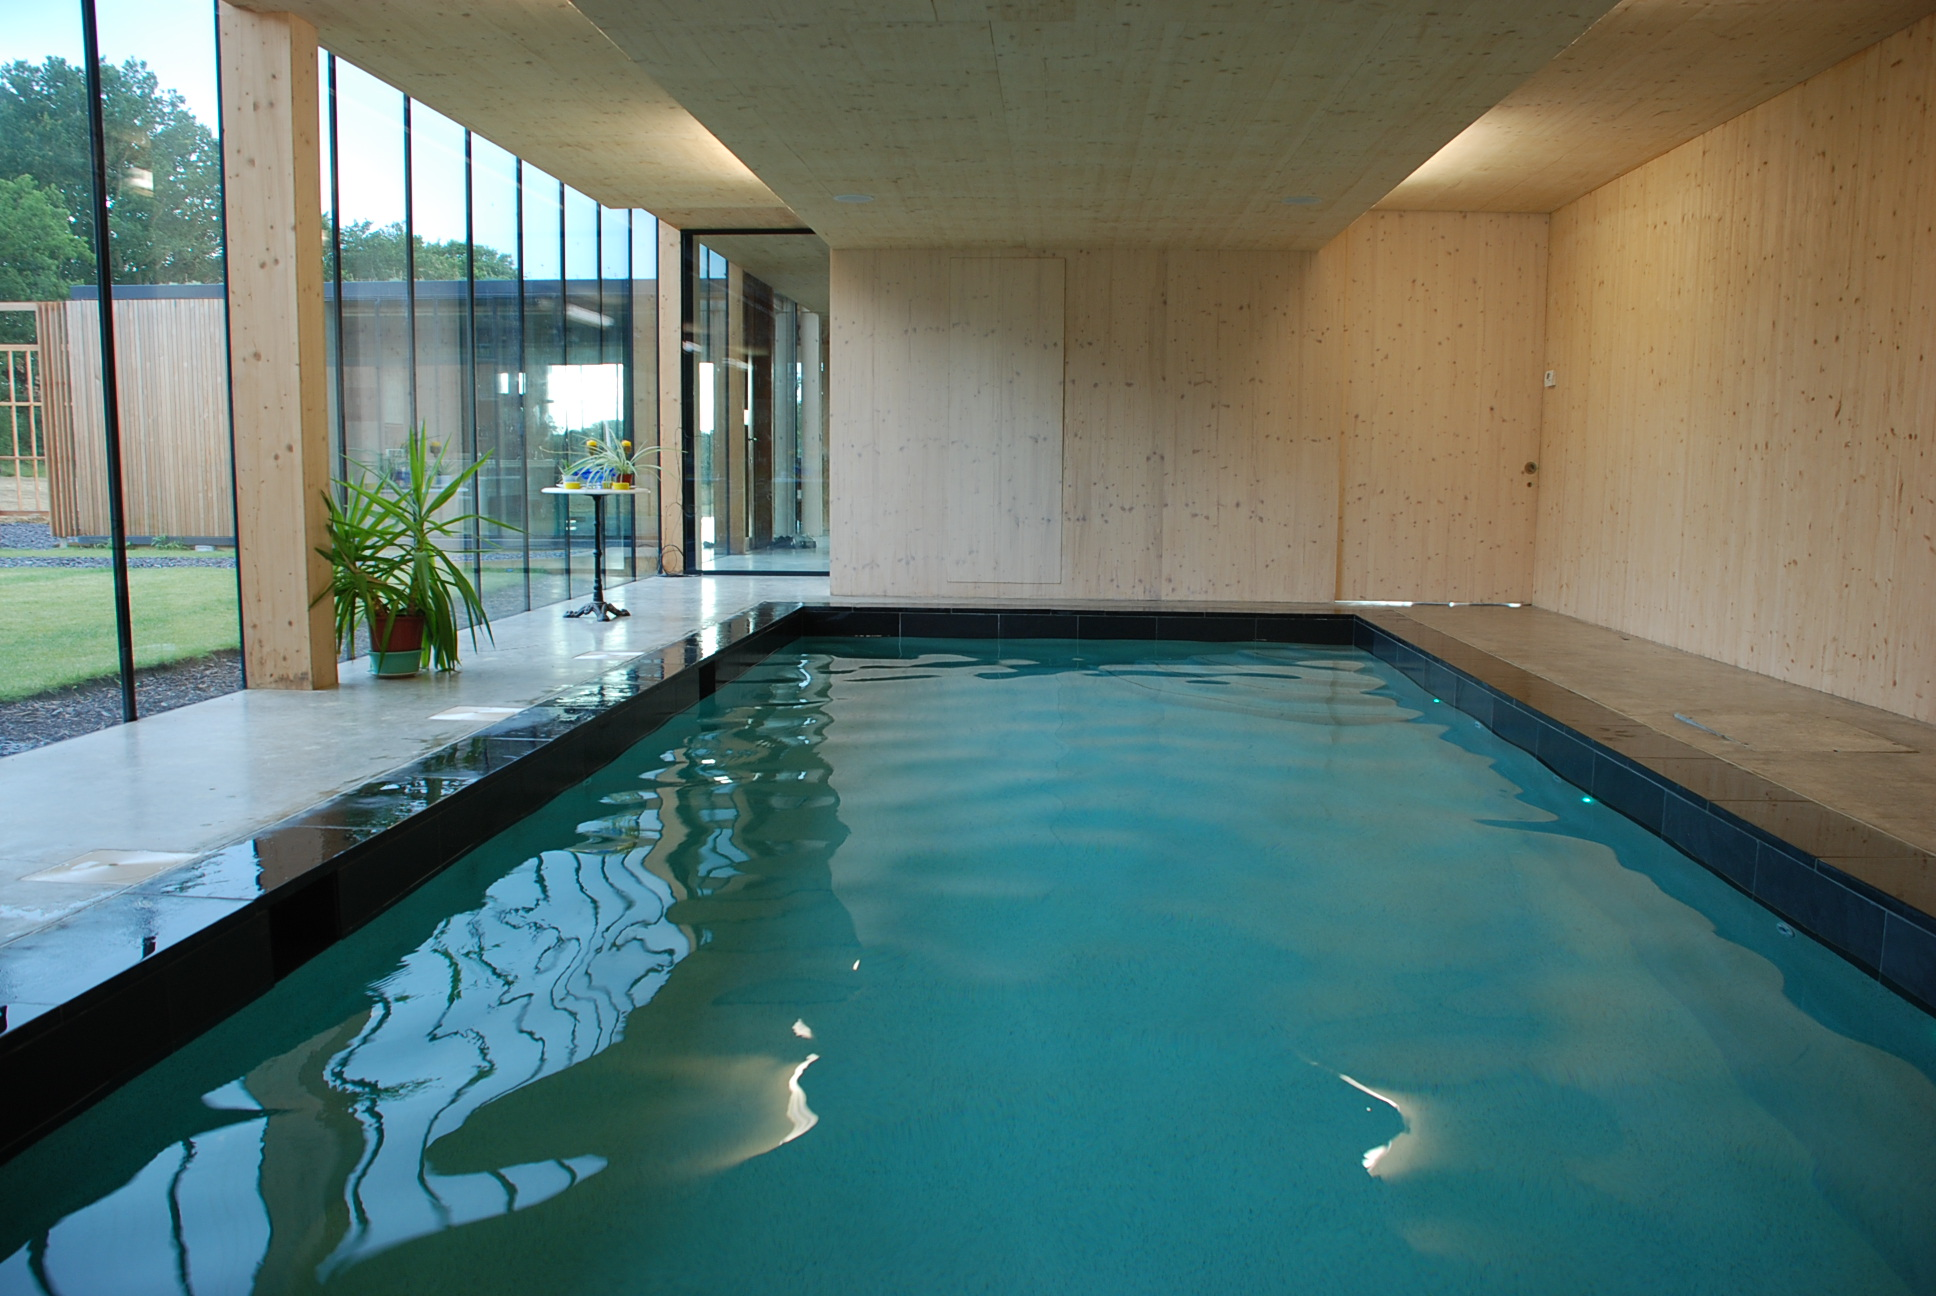 swimming pool installation price